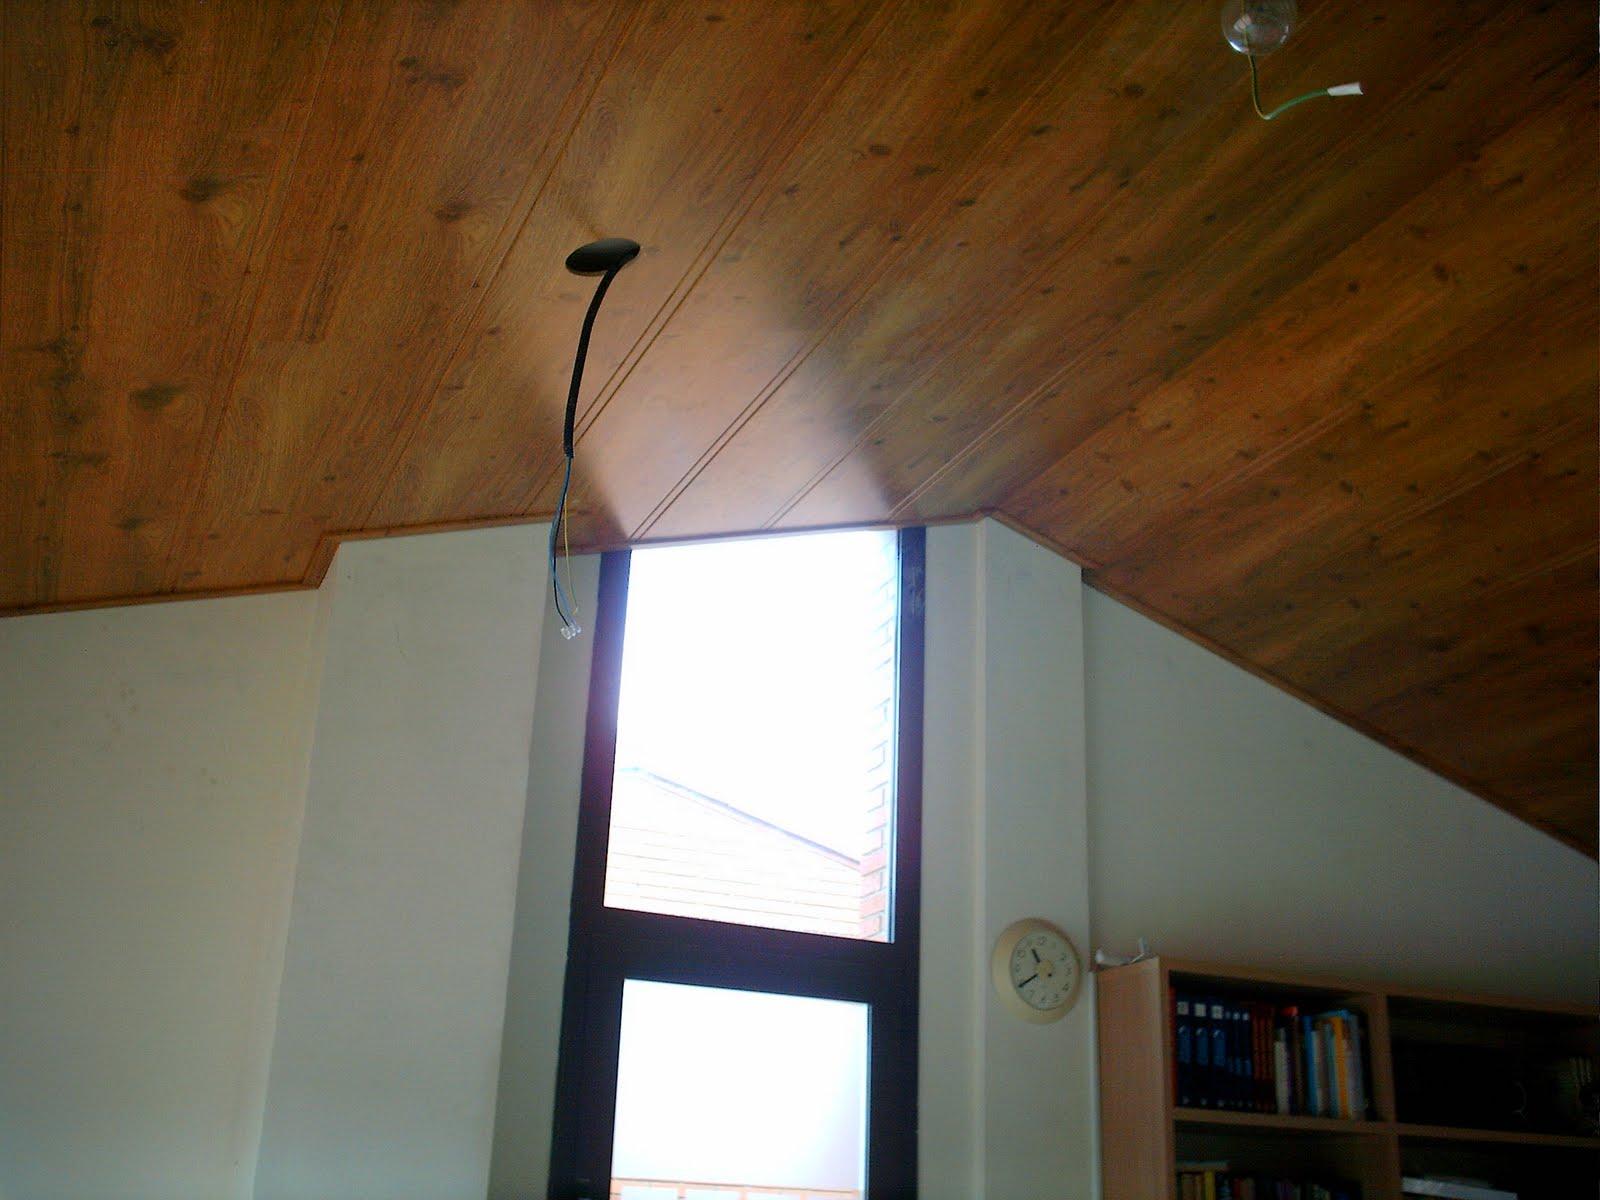 Ca uelo e hijos carpinteria s c p decoracion en madera for Falso techo rustico